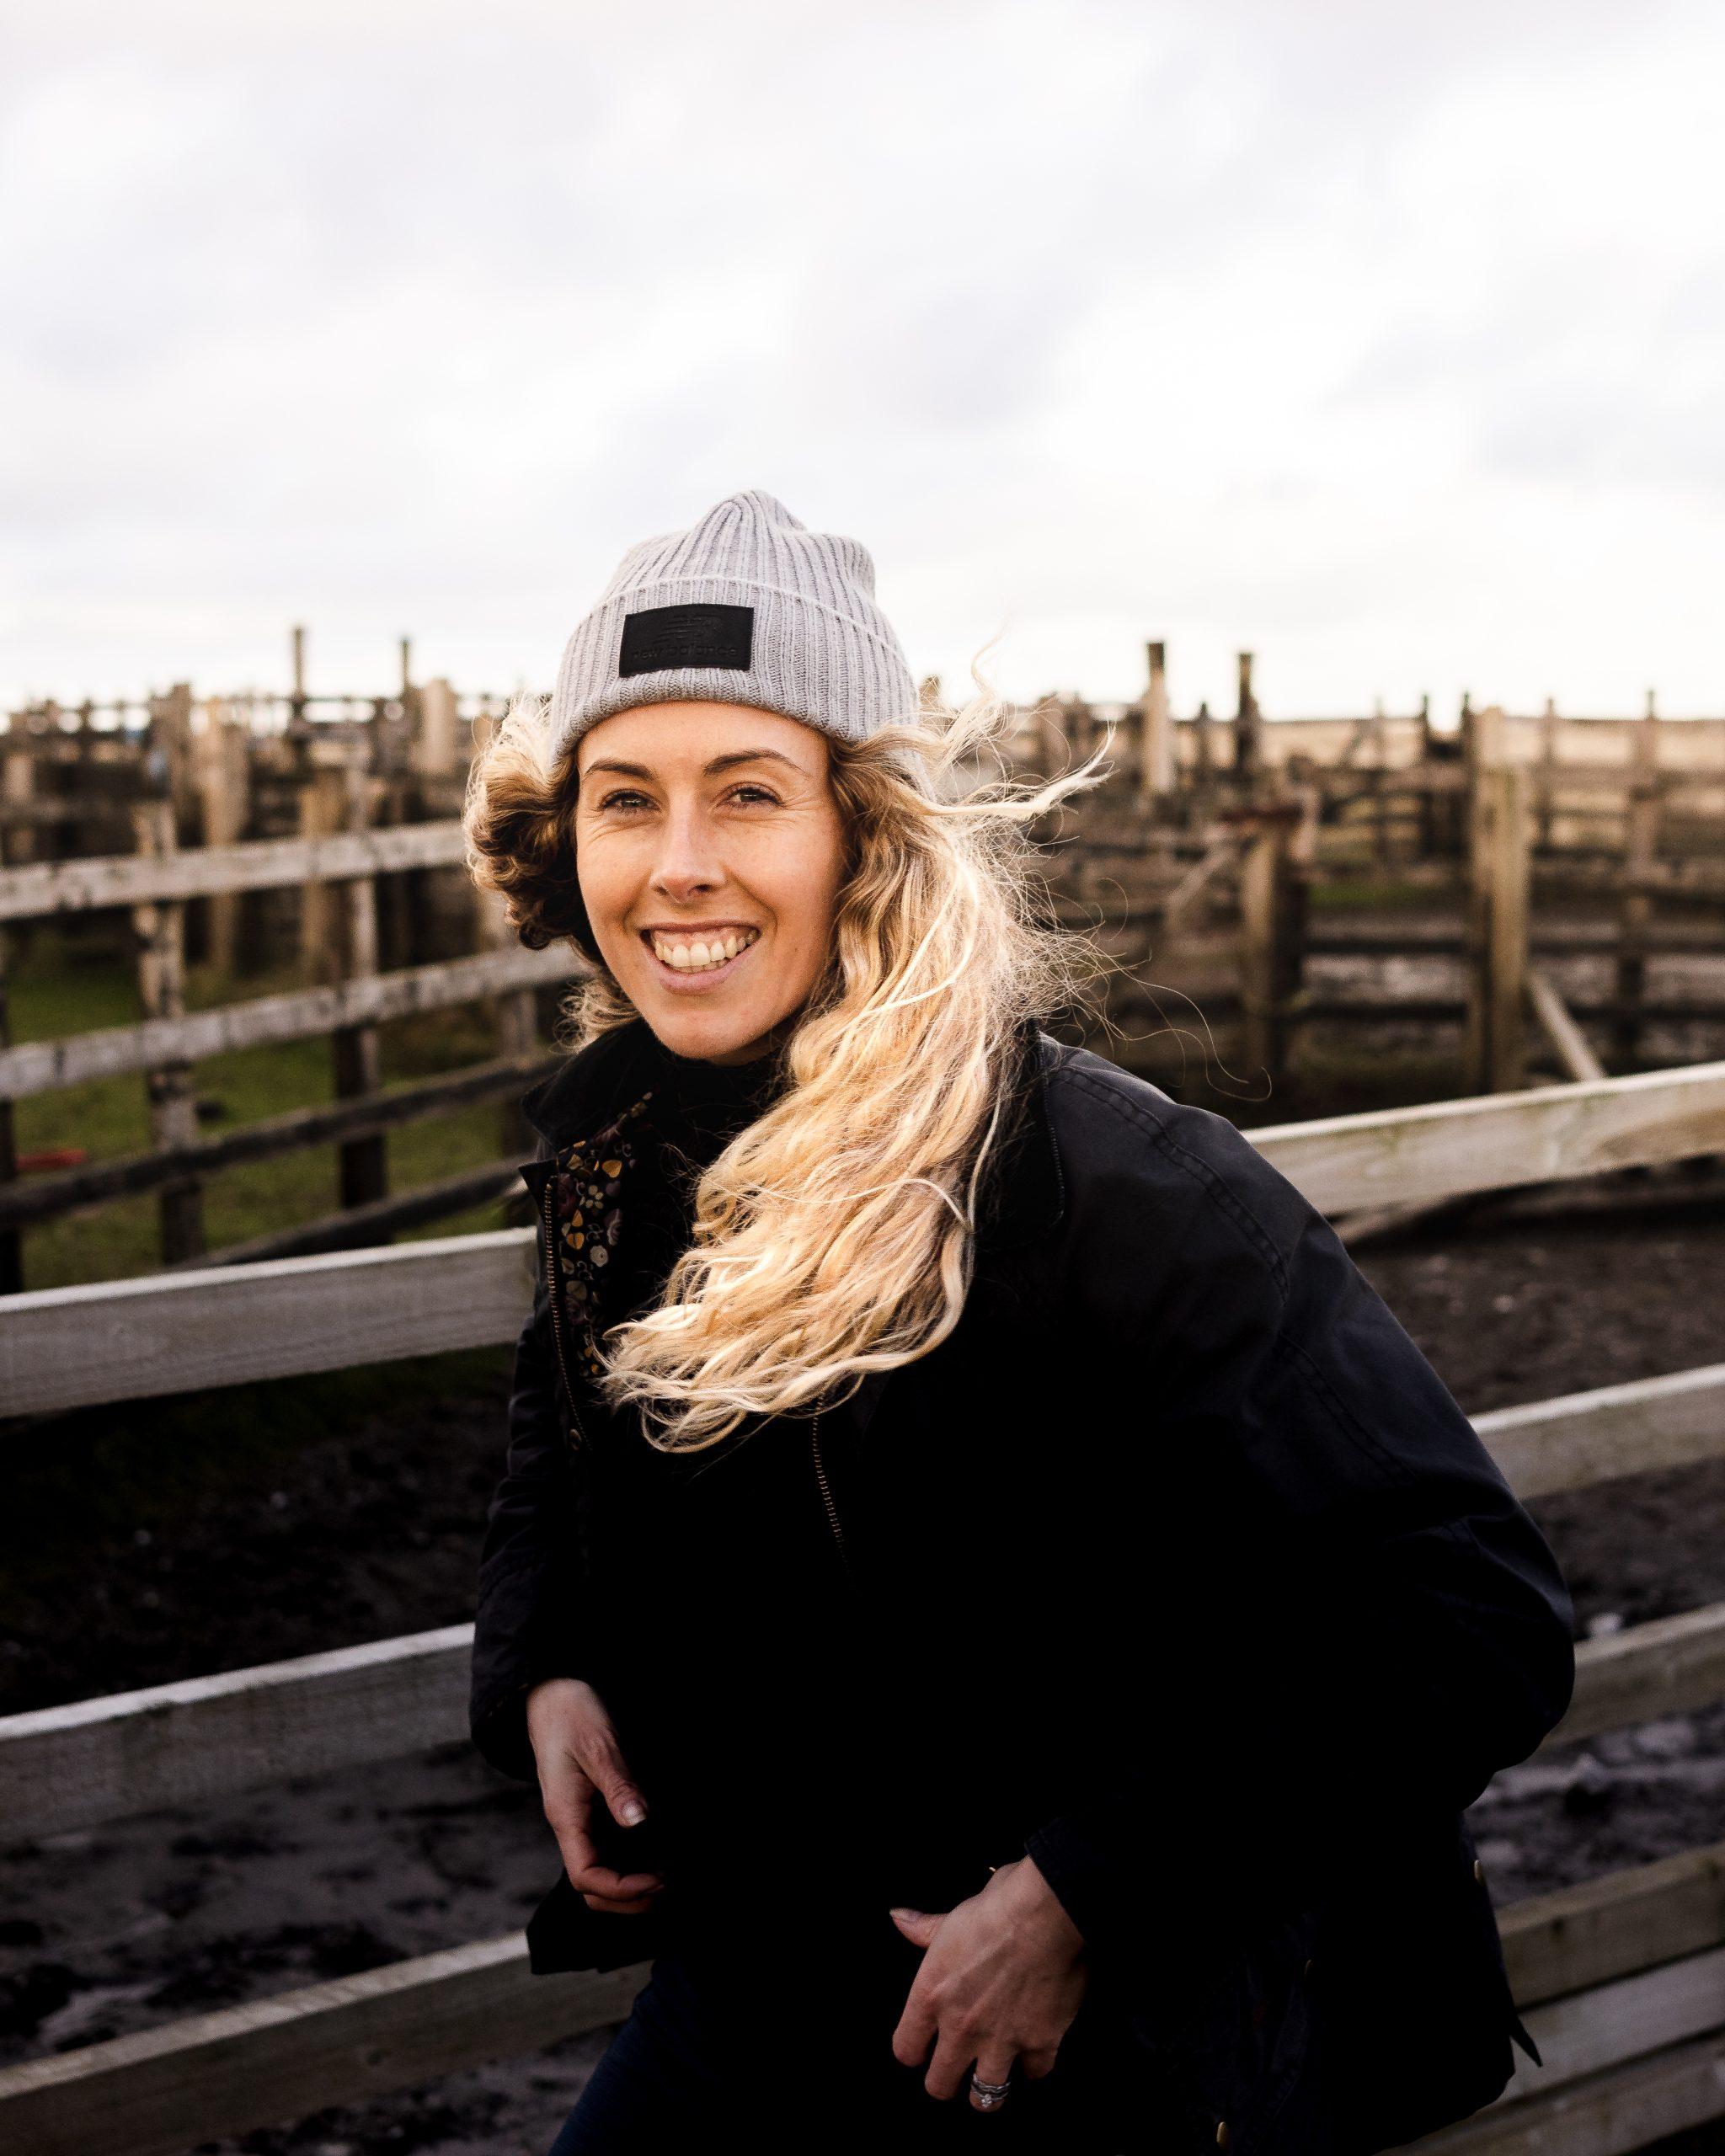 Ciara H _ Bhennypot Sheep Pens (1 of 1)